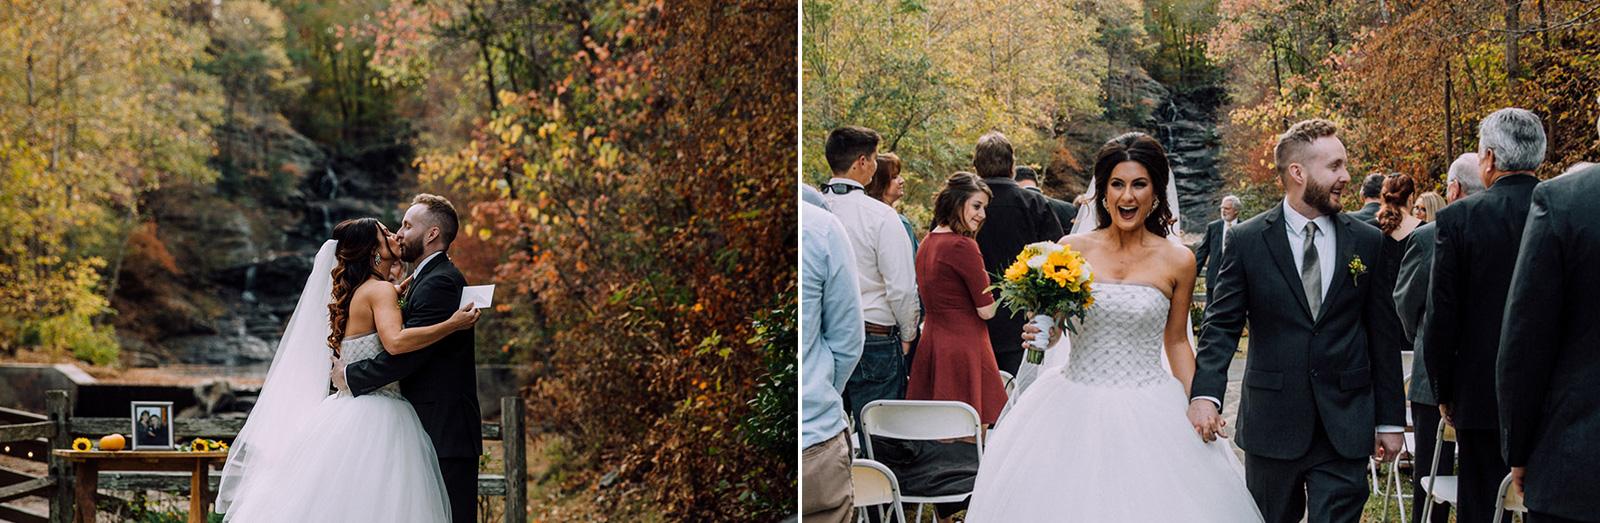 atlanta wedding photographers elopement photographer engagement photography hightower falls wedding venue_1024.jpg